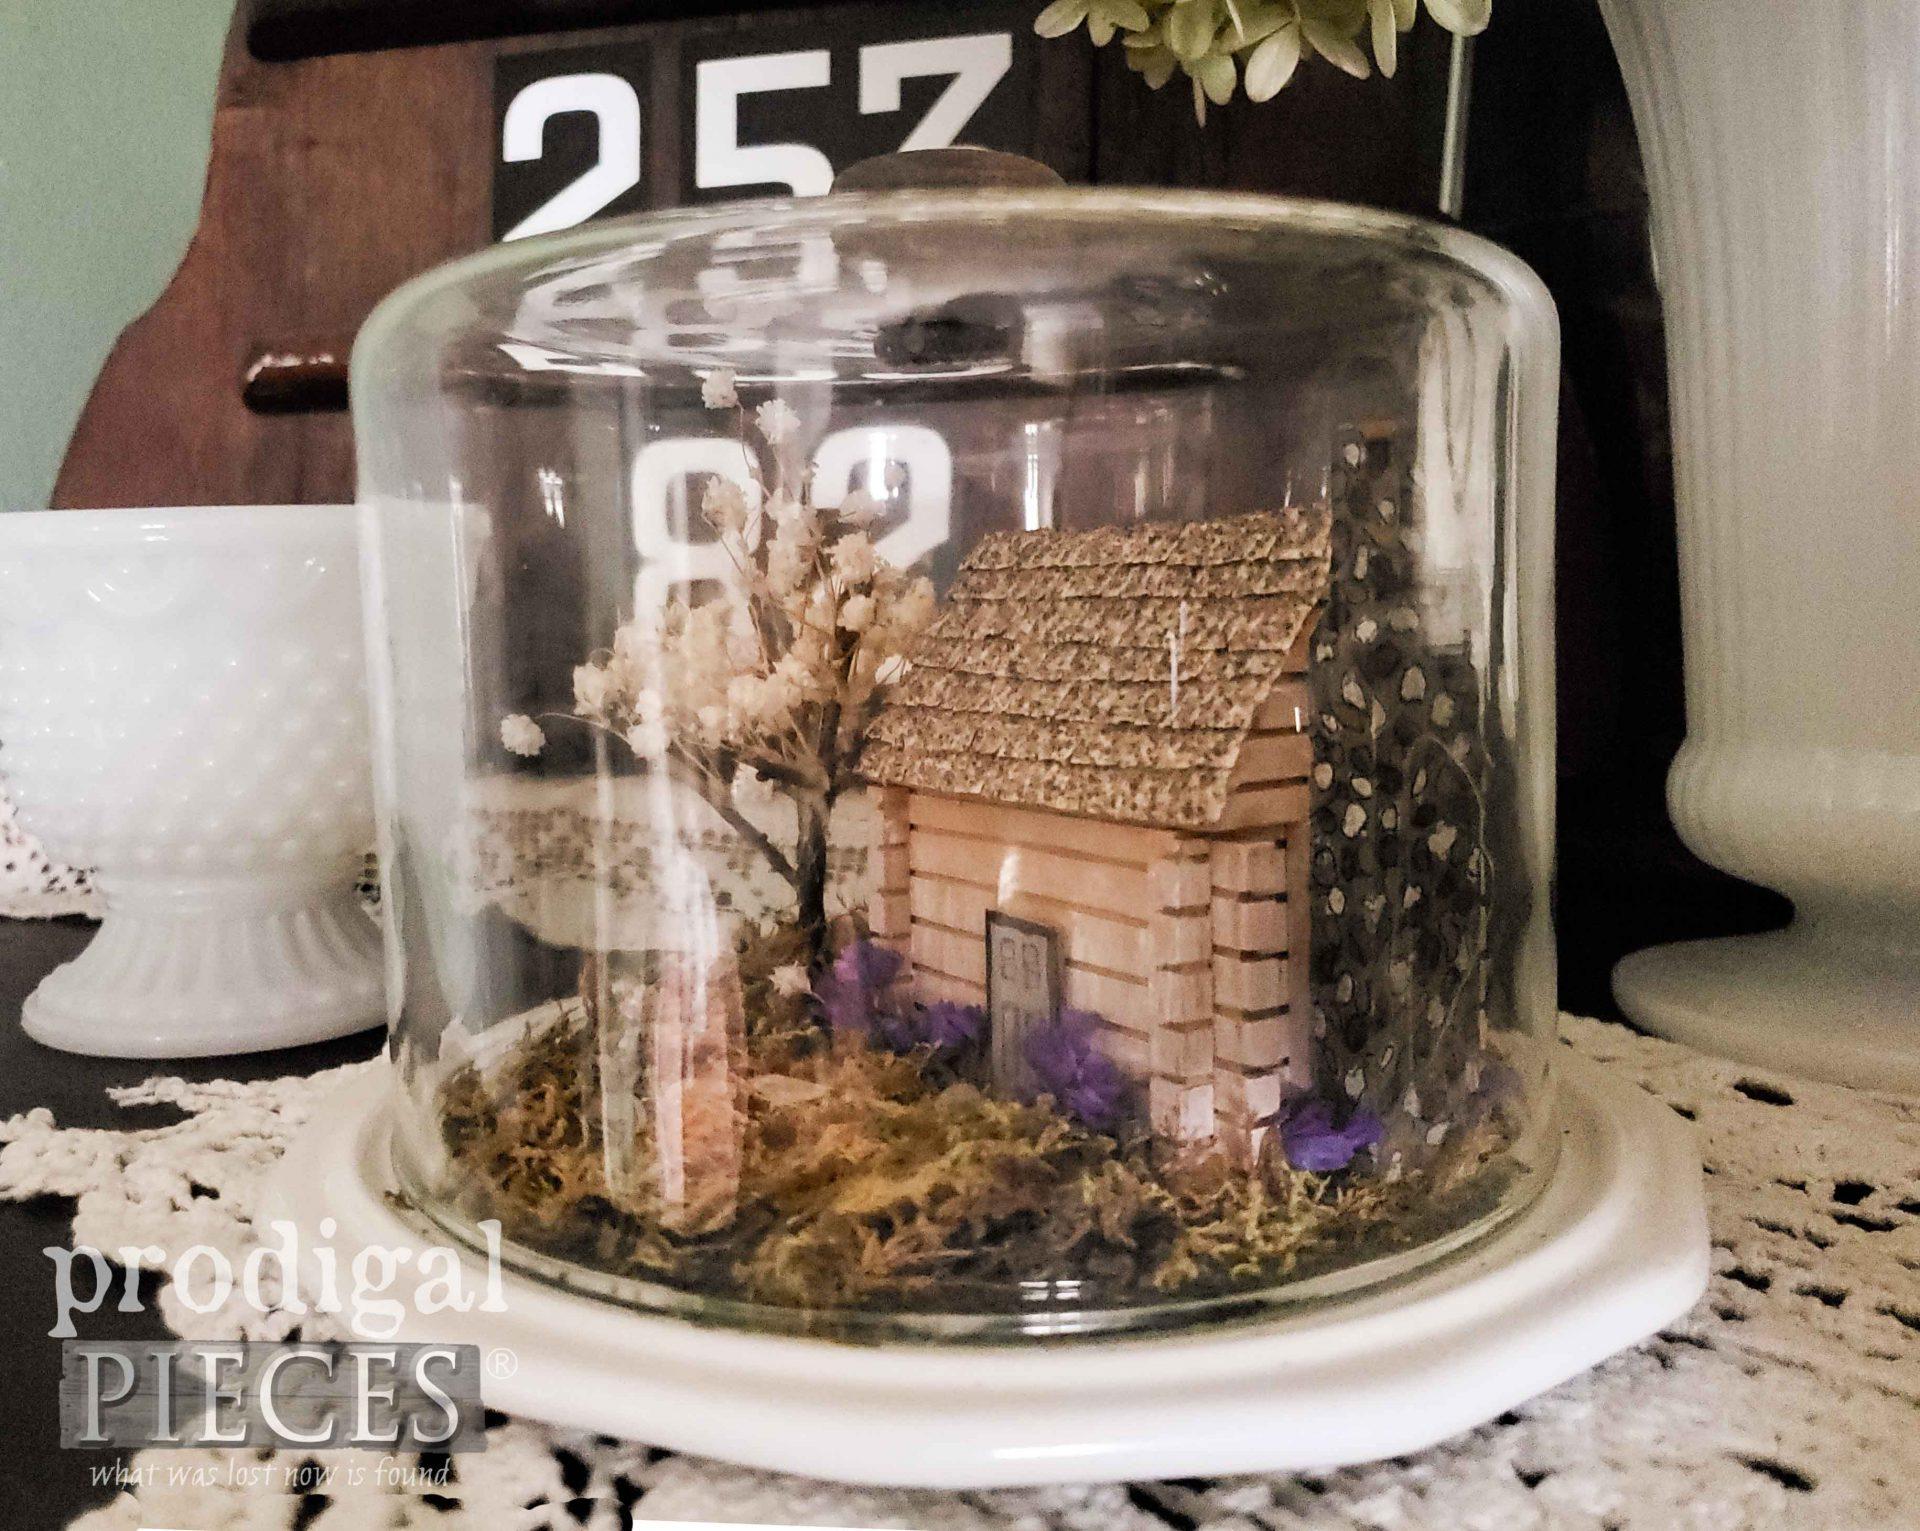 DIY Farmhouse Spring Decor by Larissa of Prodigal Pieces | prodigalpieces.com #prodigalpieces #diy #spring #home #covid19 #corona #quarantine